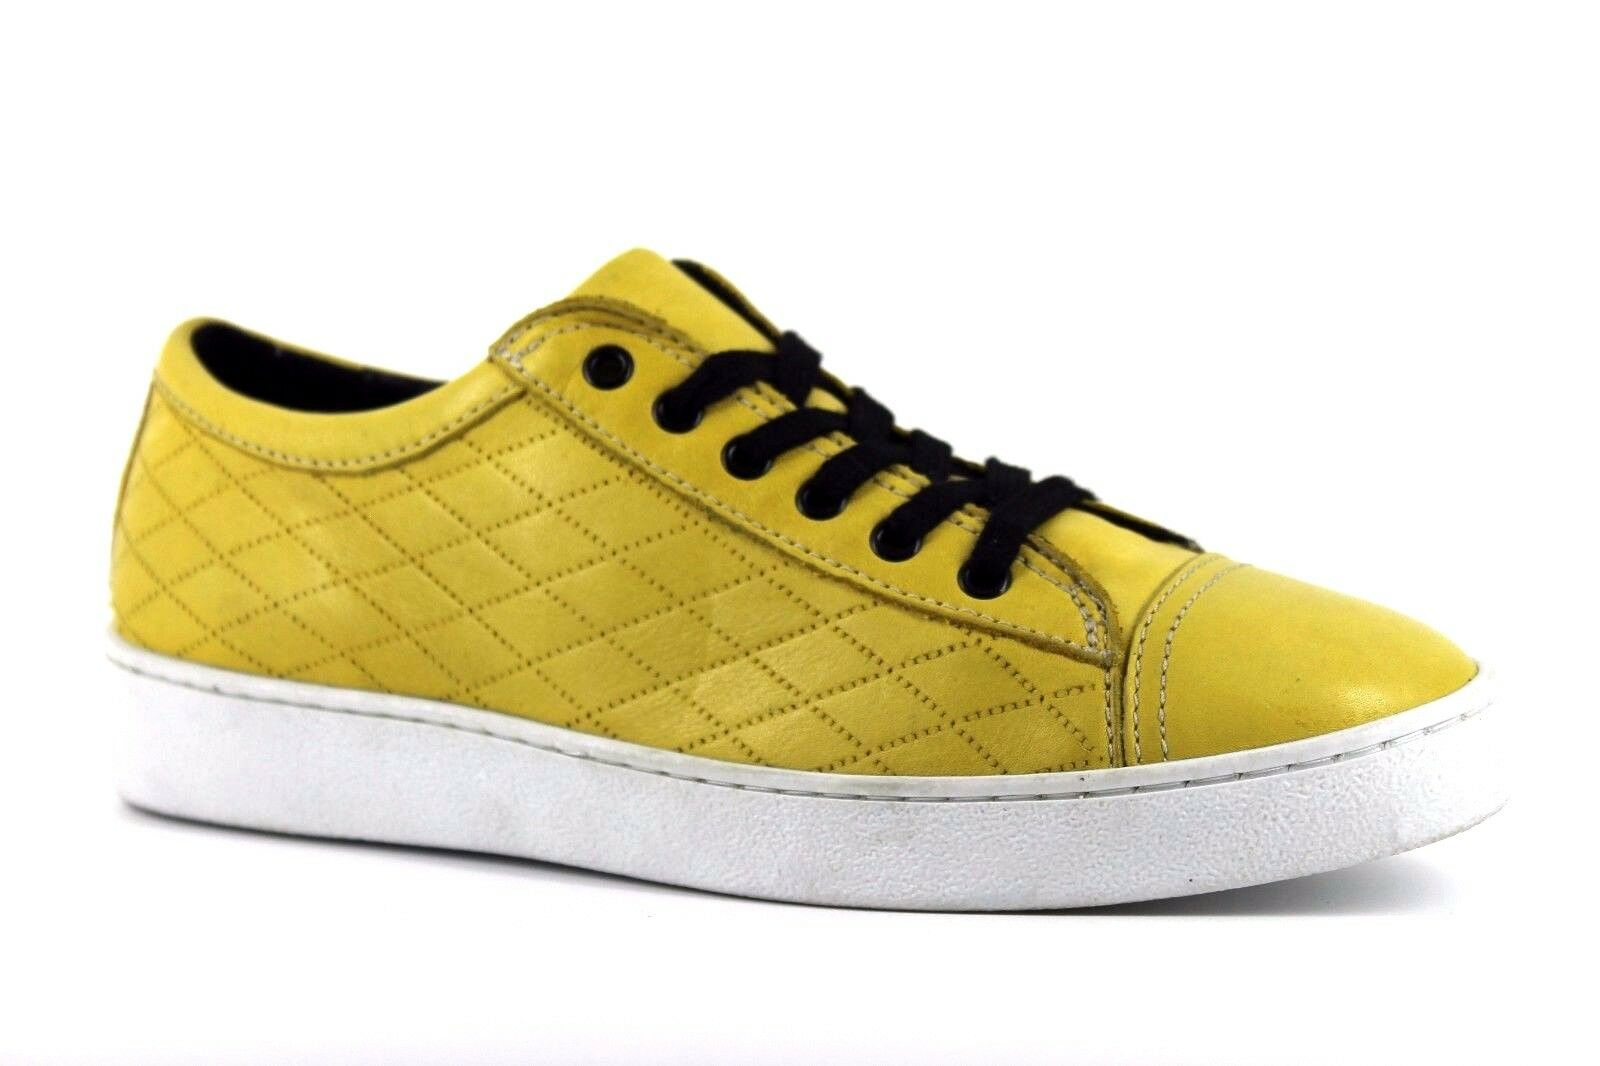 Creator Damenschuhe Yellow UK 6 EU 39 Yellow Damenschuhe WEISS Leder Lace Up Sneakers Trainers Schuhes 2d7137